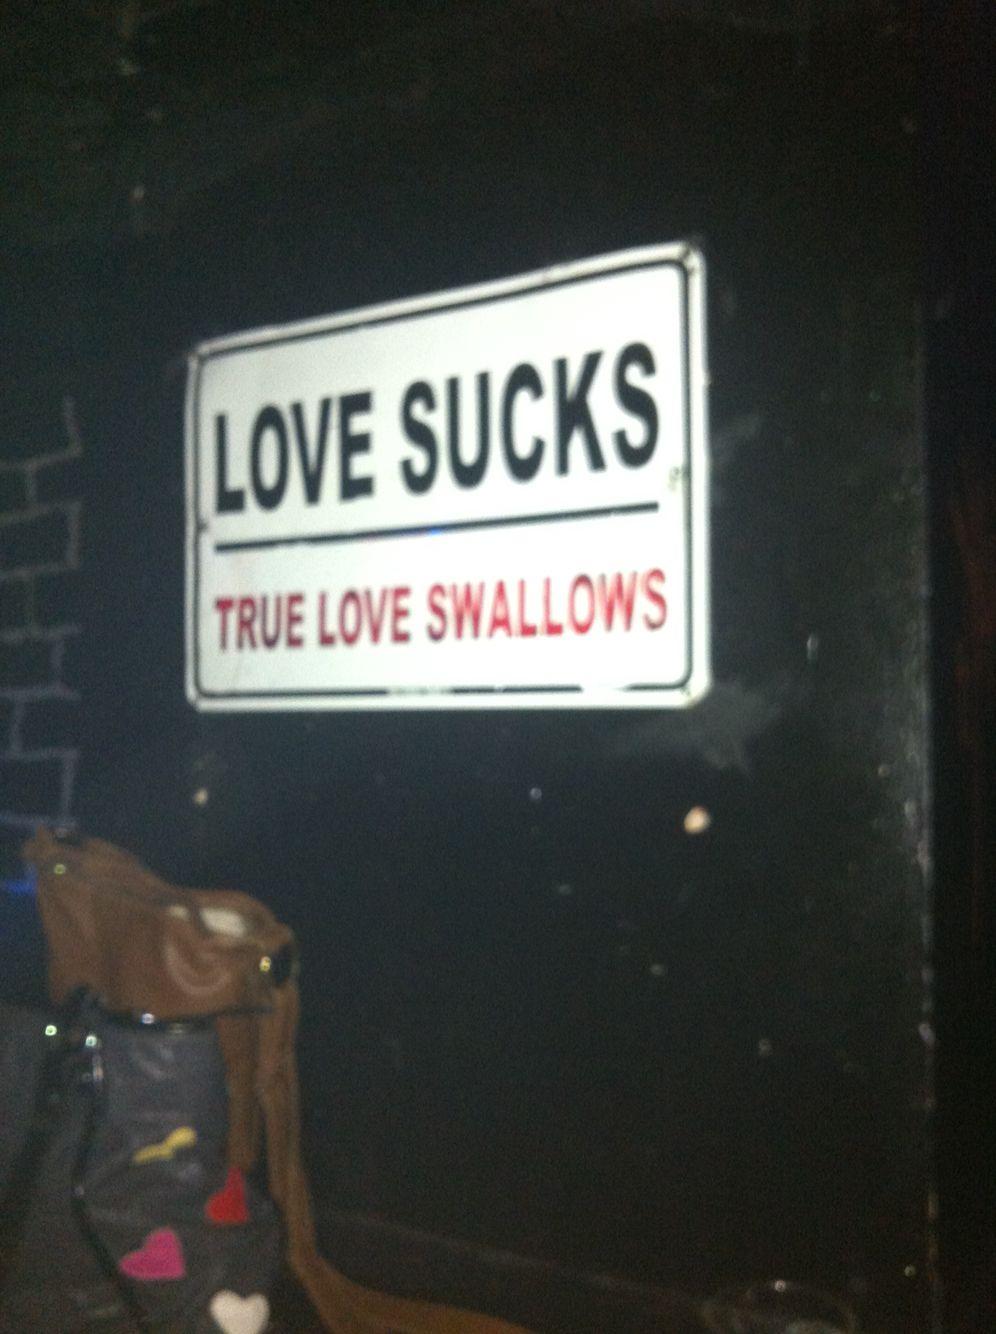 Love Sucks Quotes Love Sucks True Love Swallows  Quotes  Pinterest  Swallows